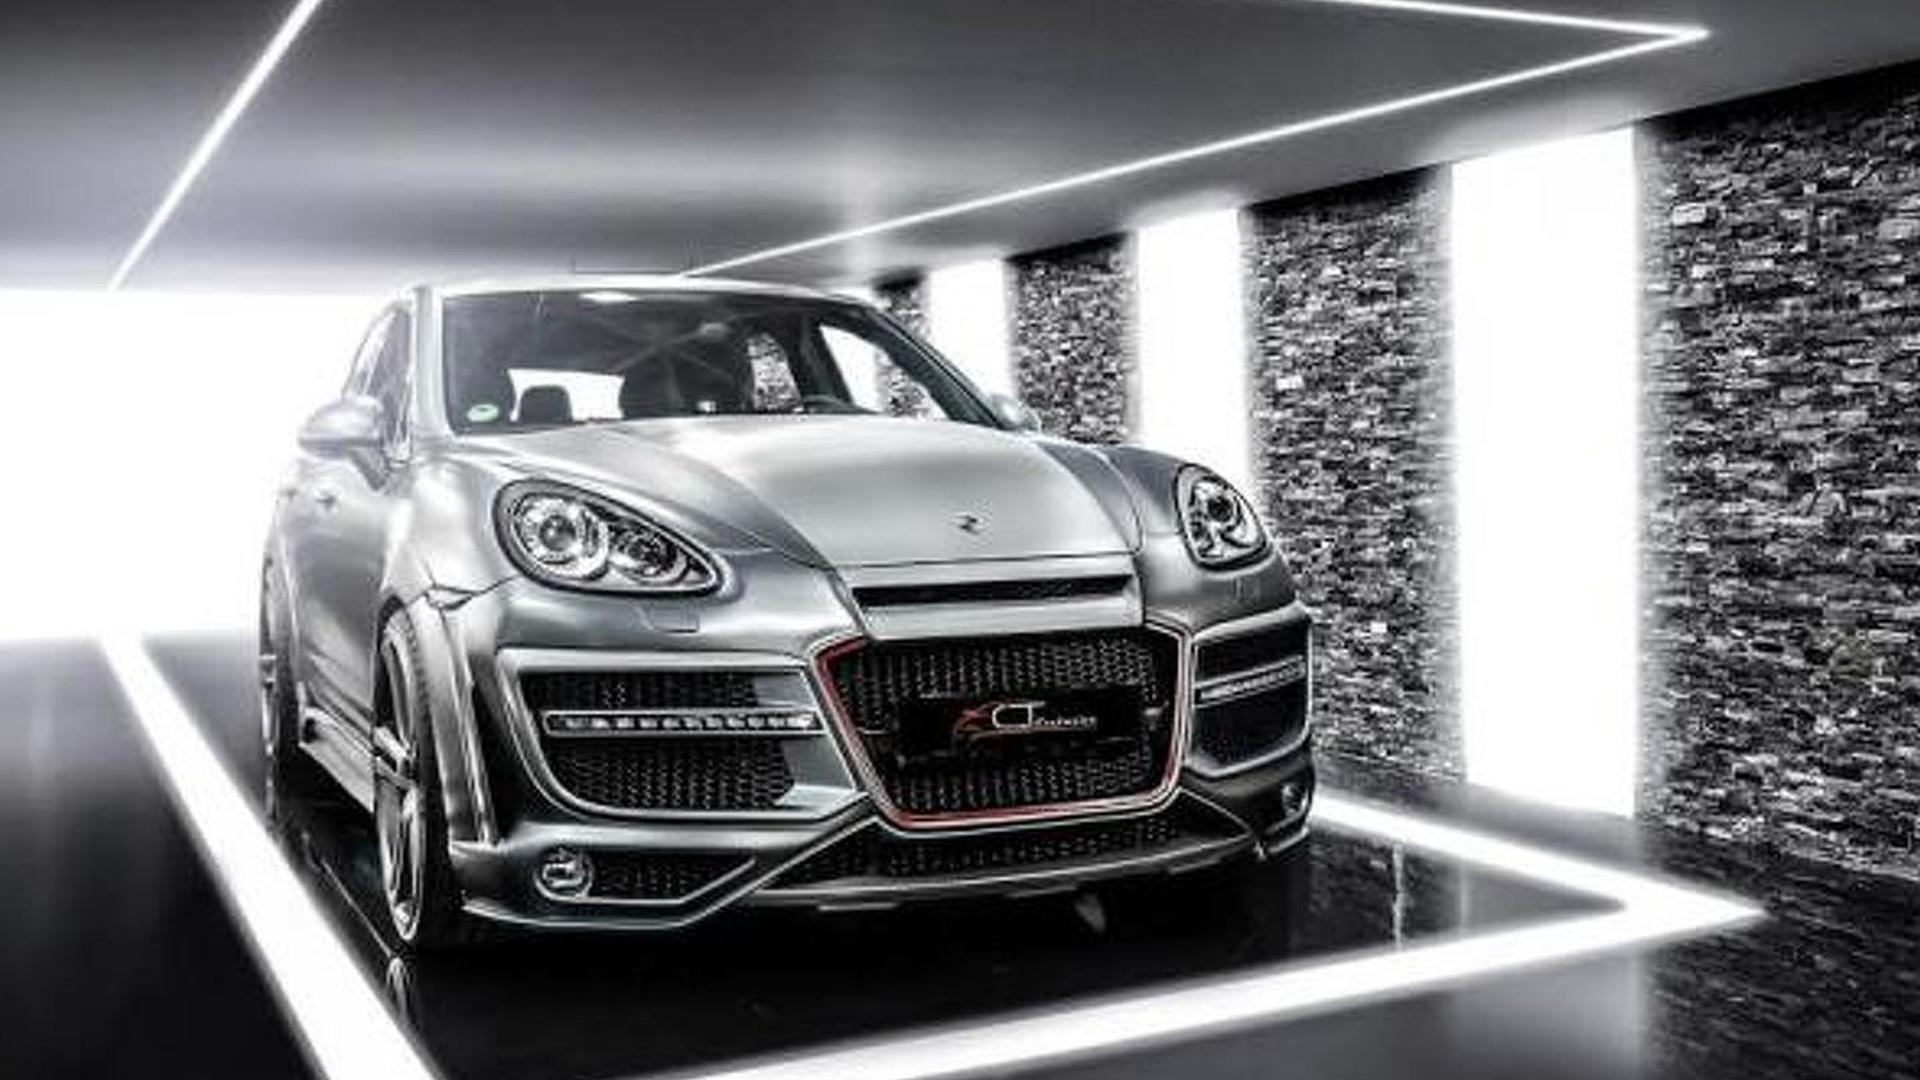 Тюнинг Porsche Cayenne. Обвес от CT Exclusive